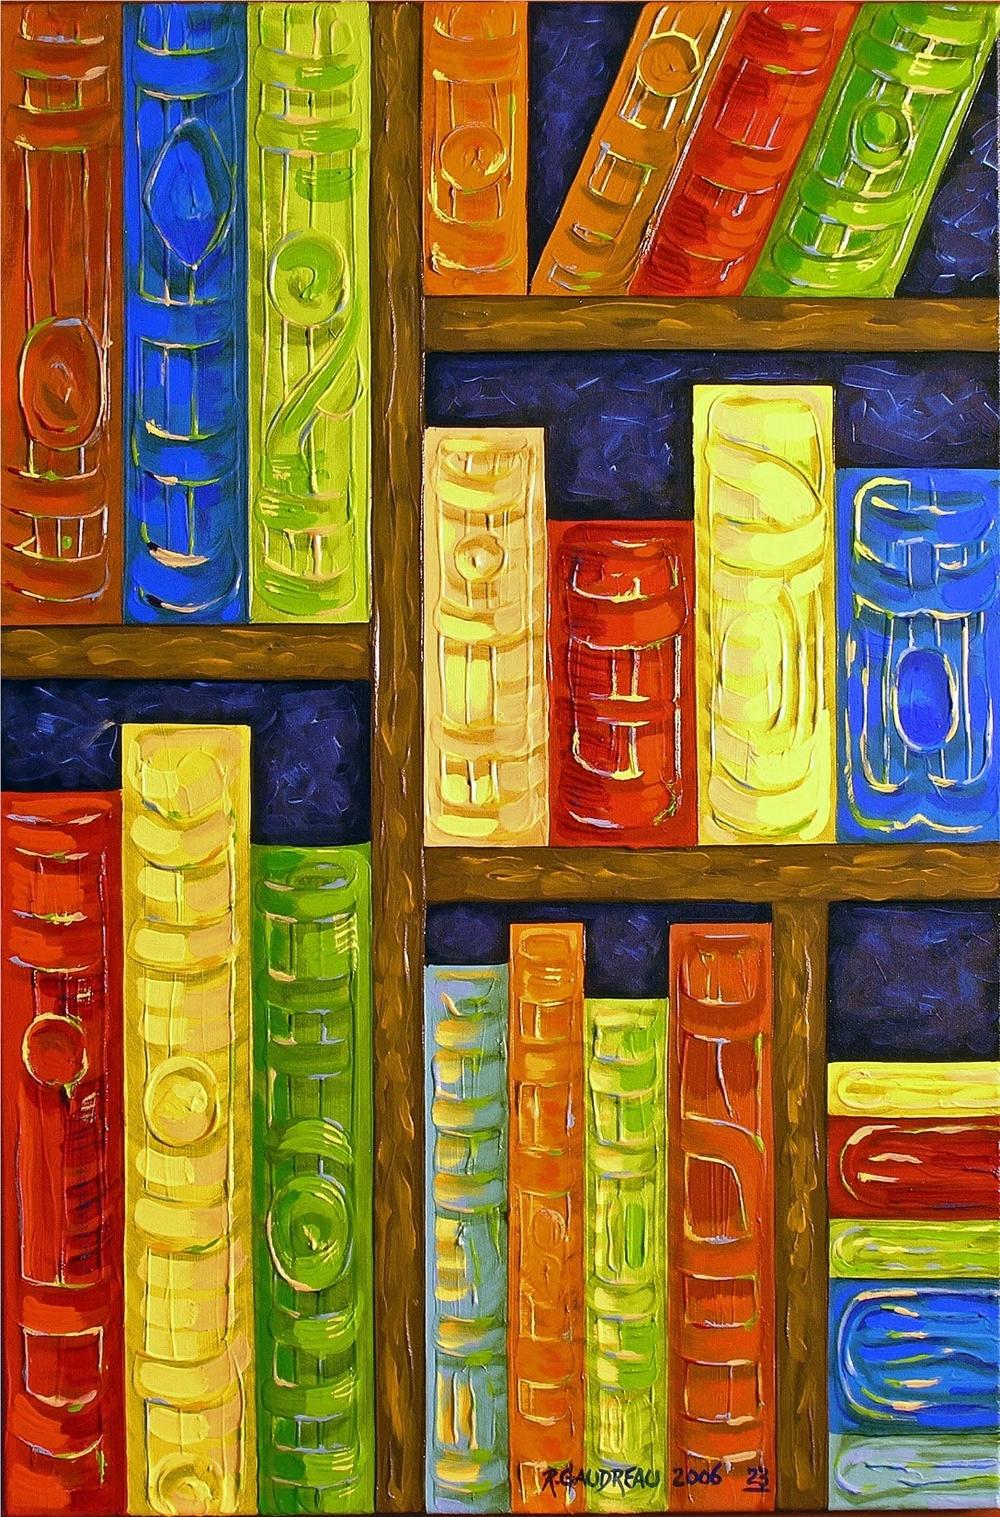 1250 23 Books Max pxl MasterJPG.jpg